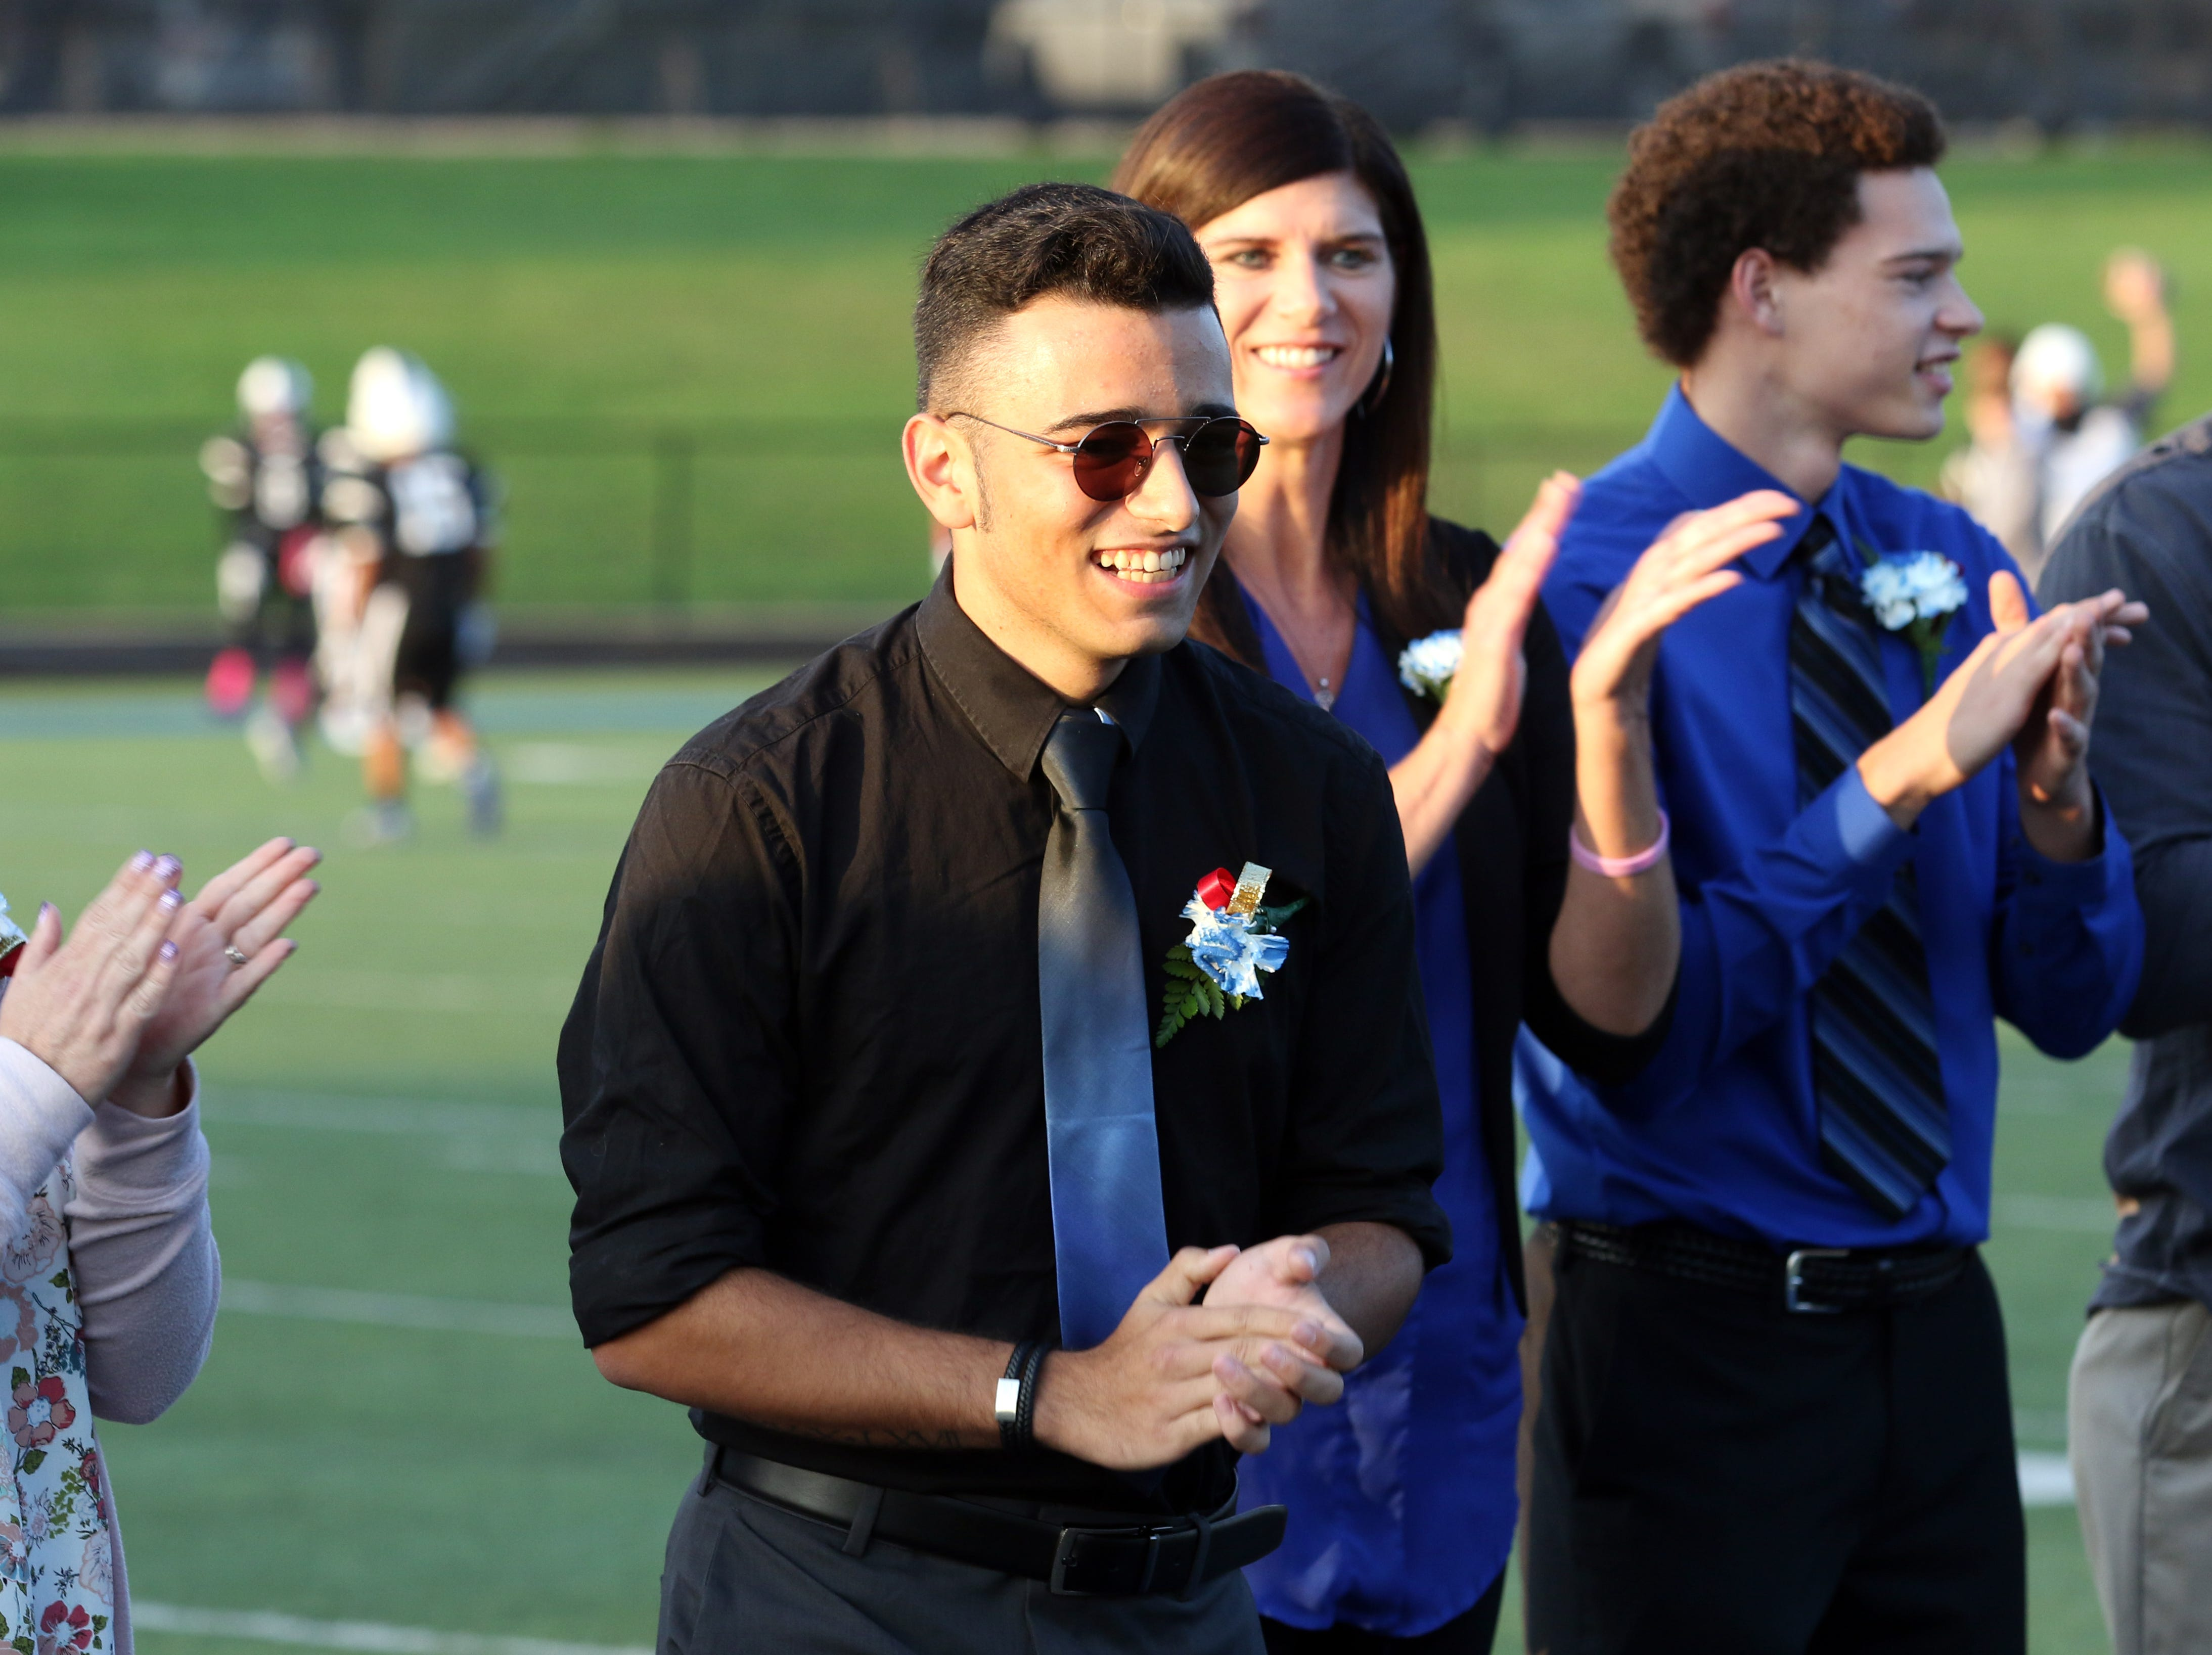 Berke Kizilcan was named Zanesville High School homecoming king.